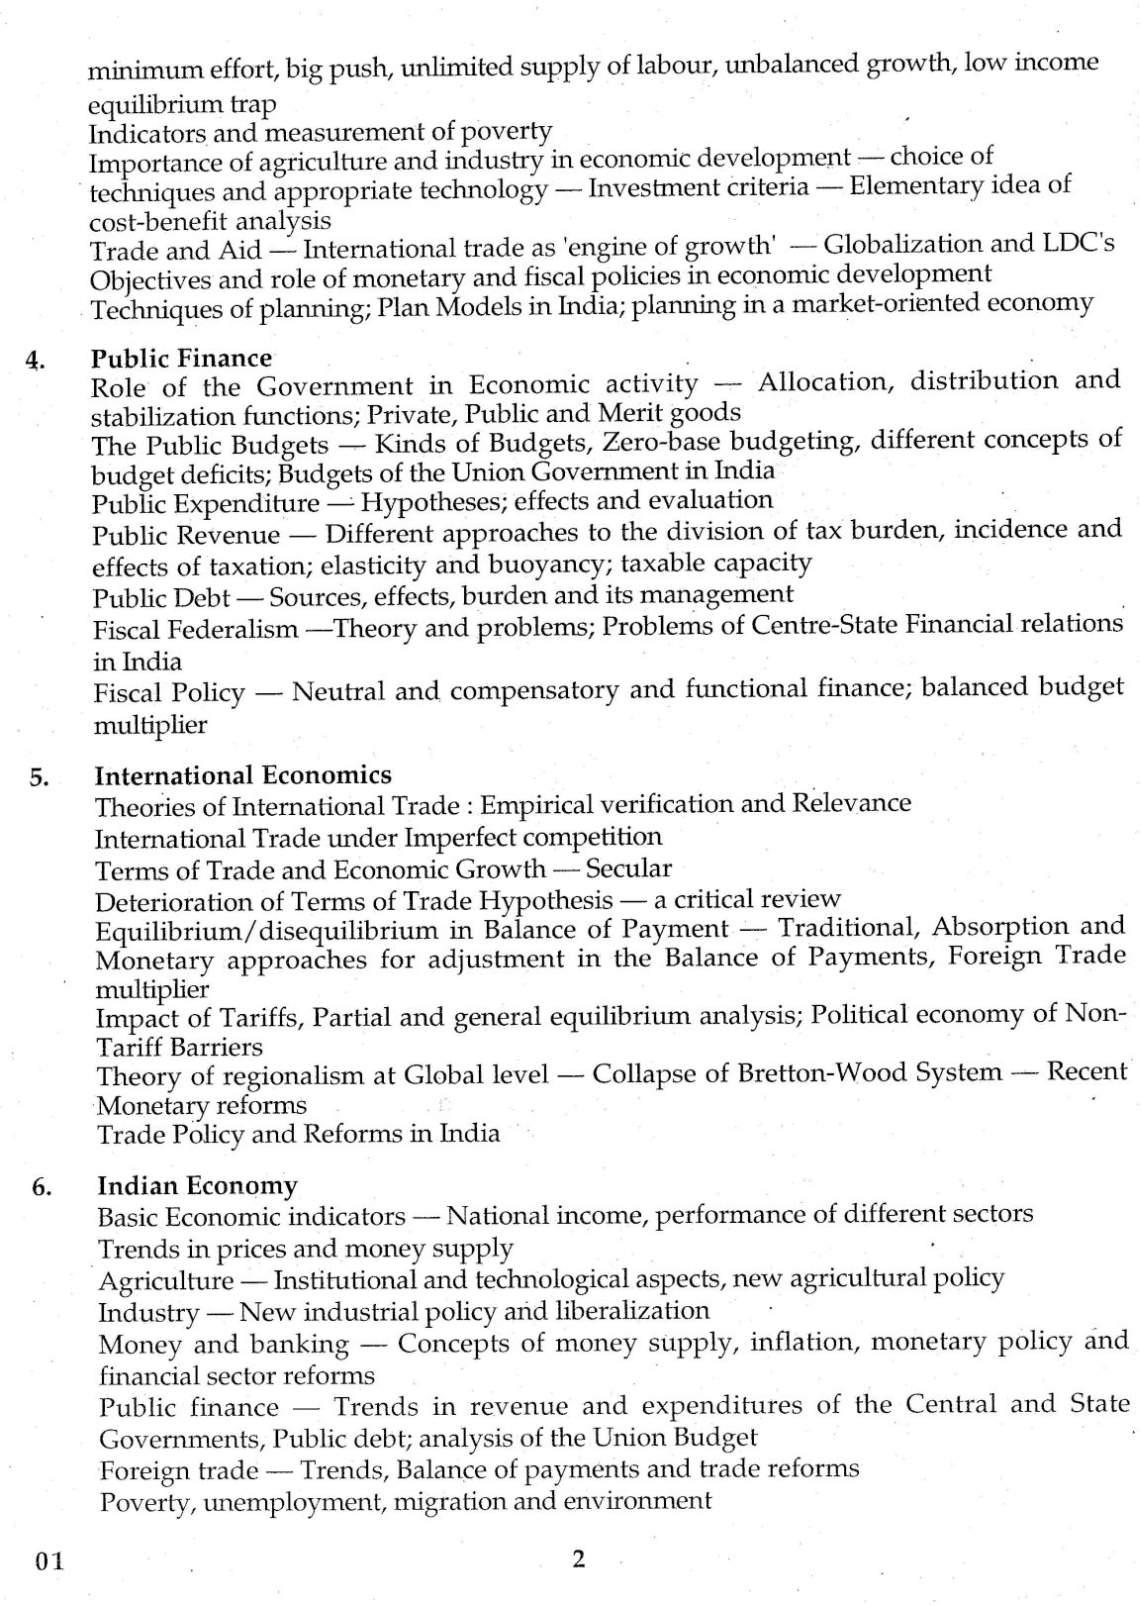 UGC NET Economics Solved Question Paper - 2020 2021 ...